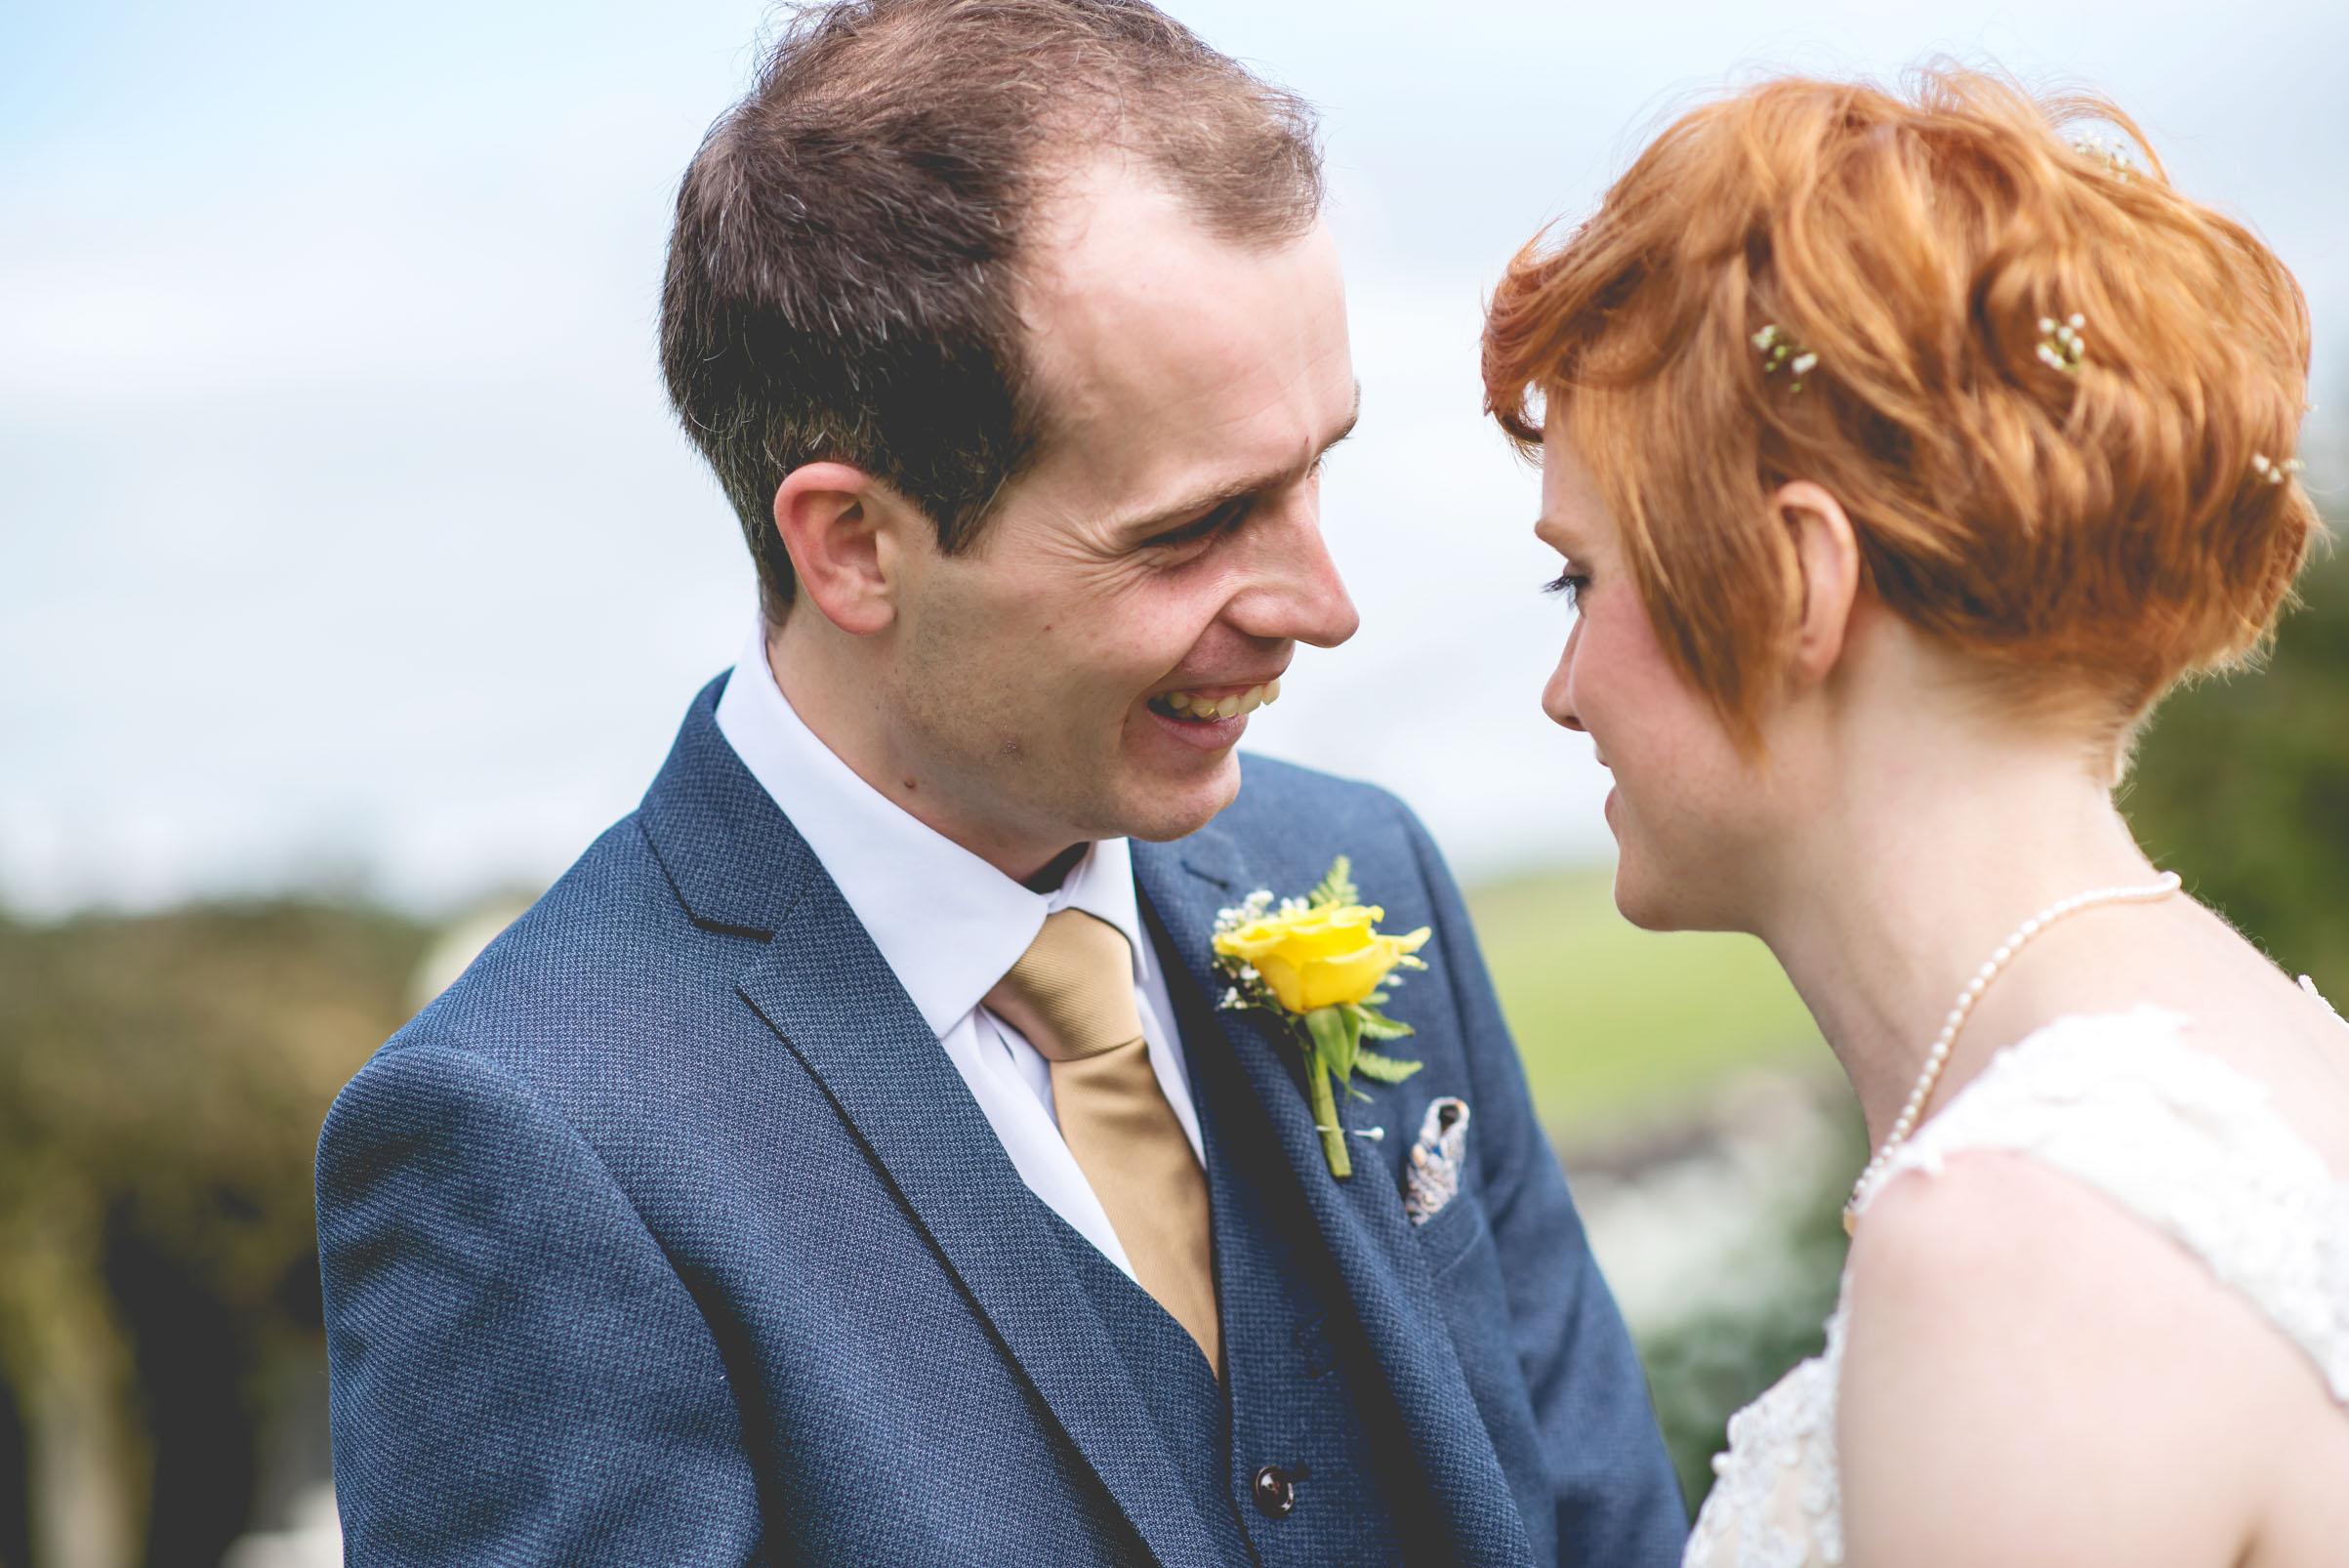 Peak+district+farm+wedding+lower+damgate+photographer-89.jpg